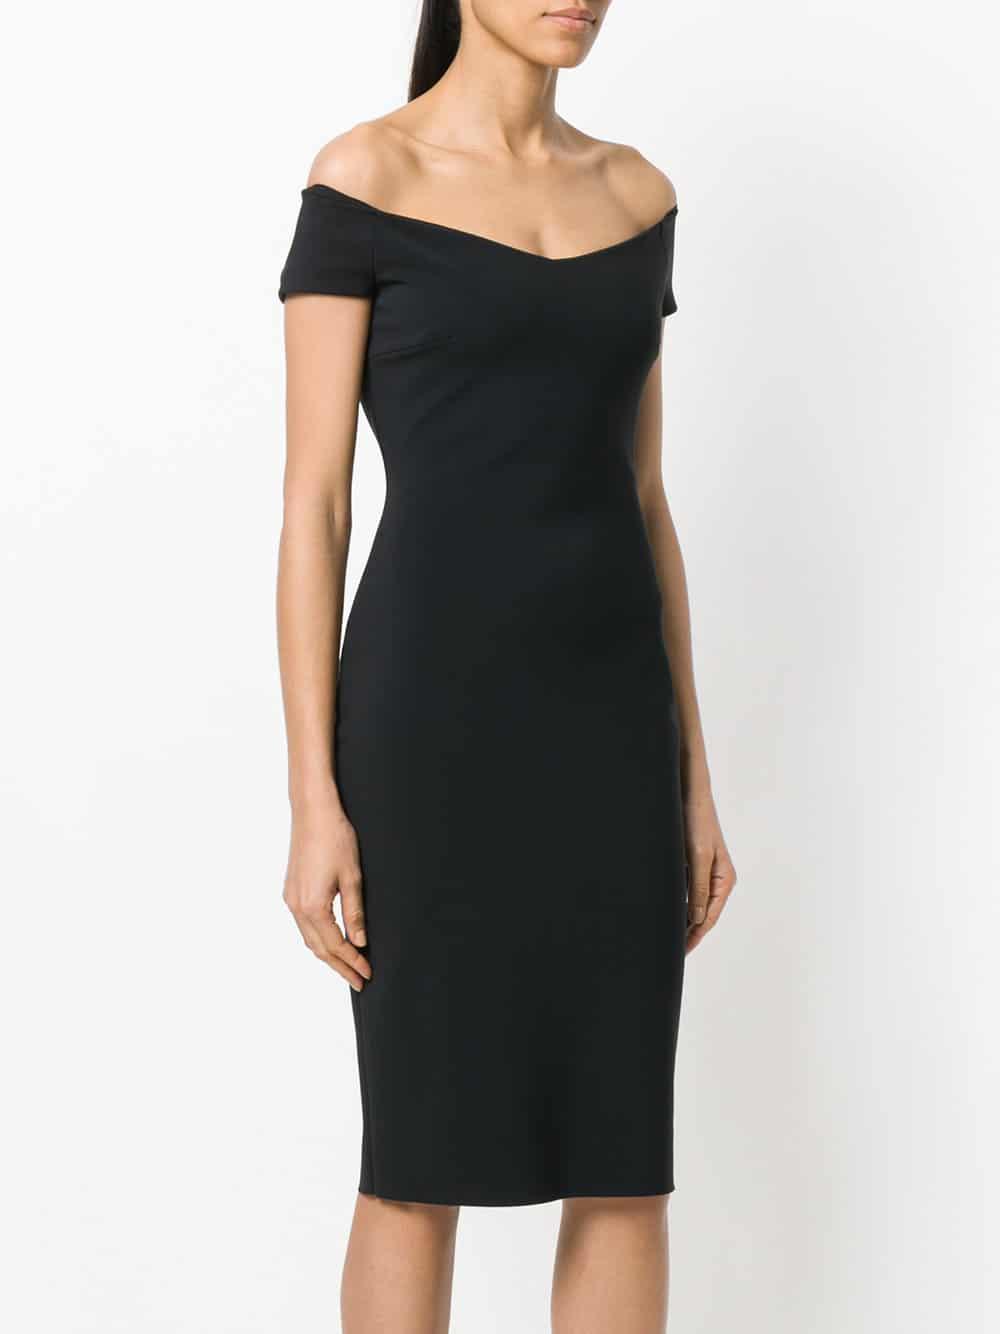 9d80f33a9cf4 CHIARA BONI LA PETITE ROBE Off Shoulder Fitted Black Dress - We ...